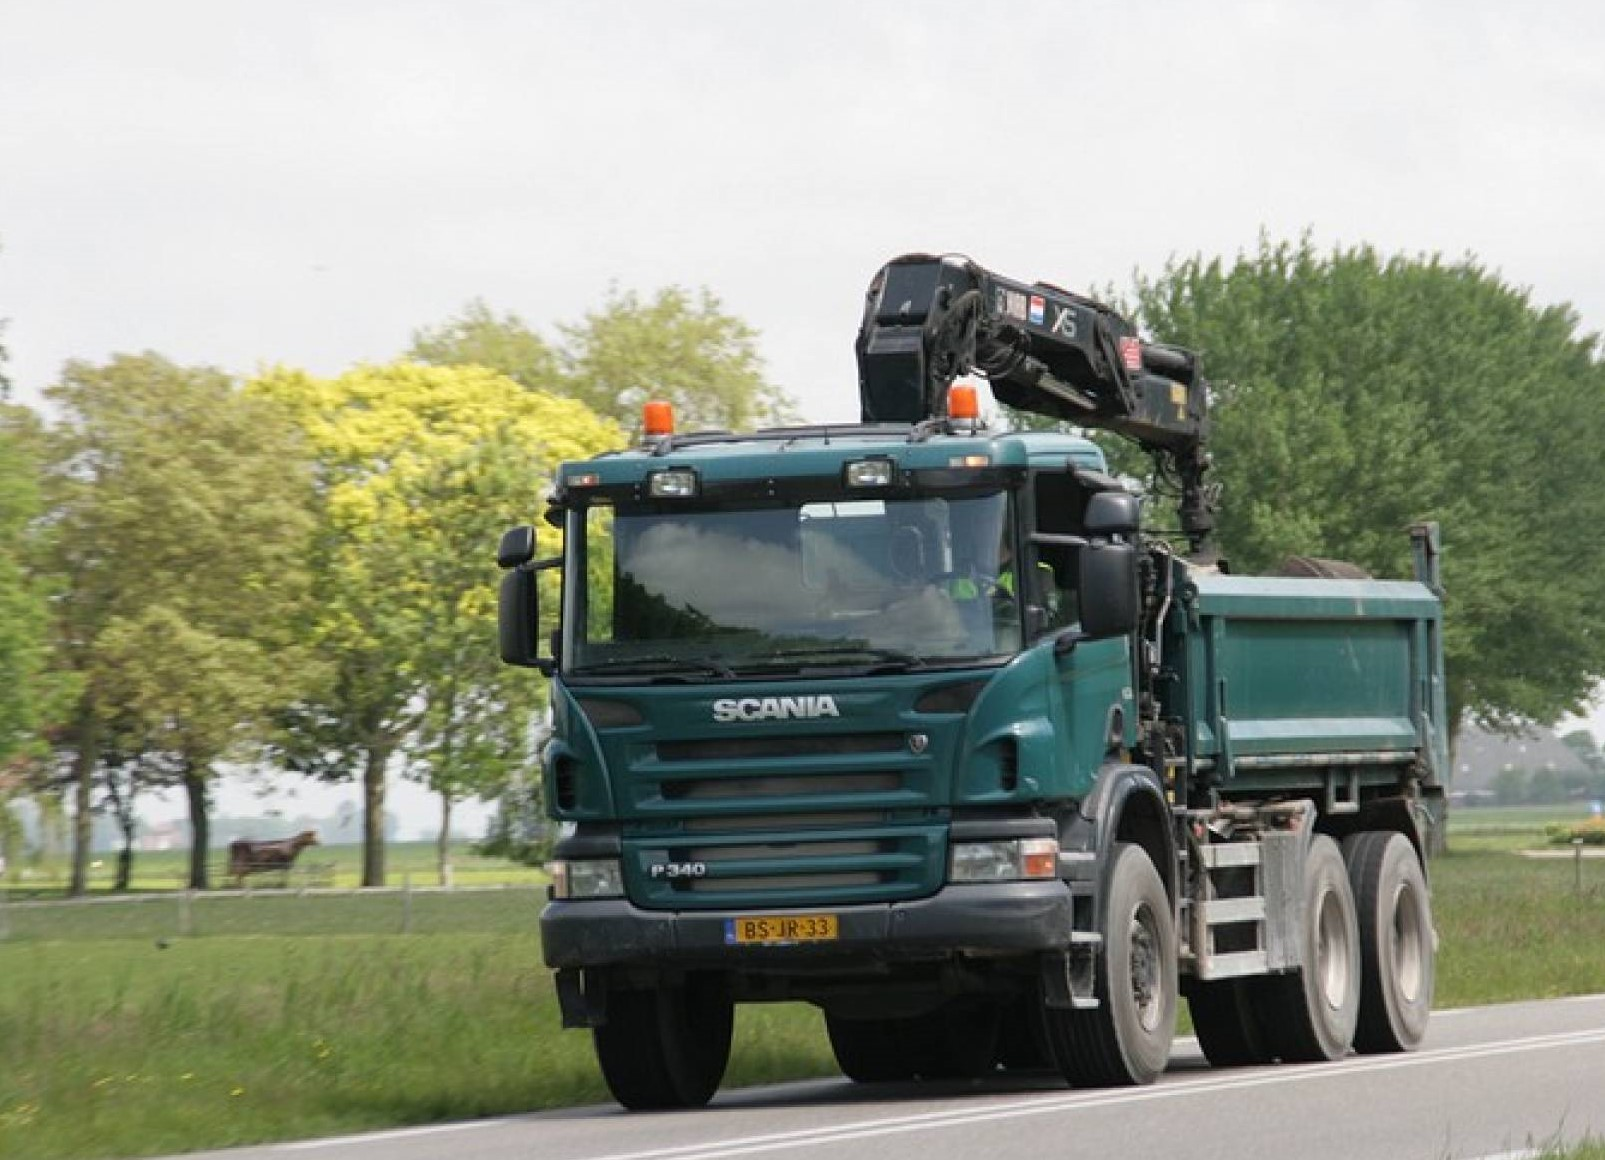 Scania-P340-2